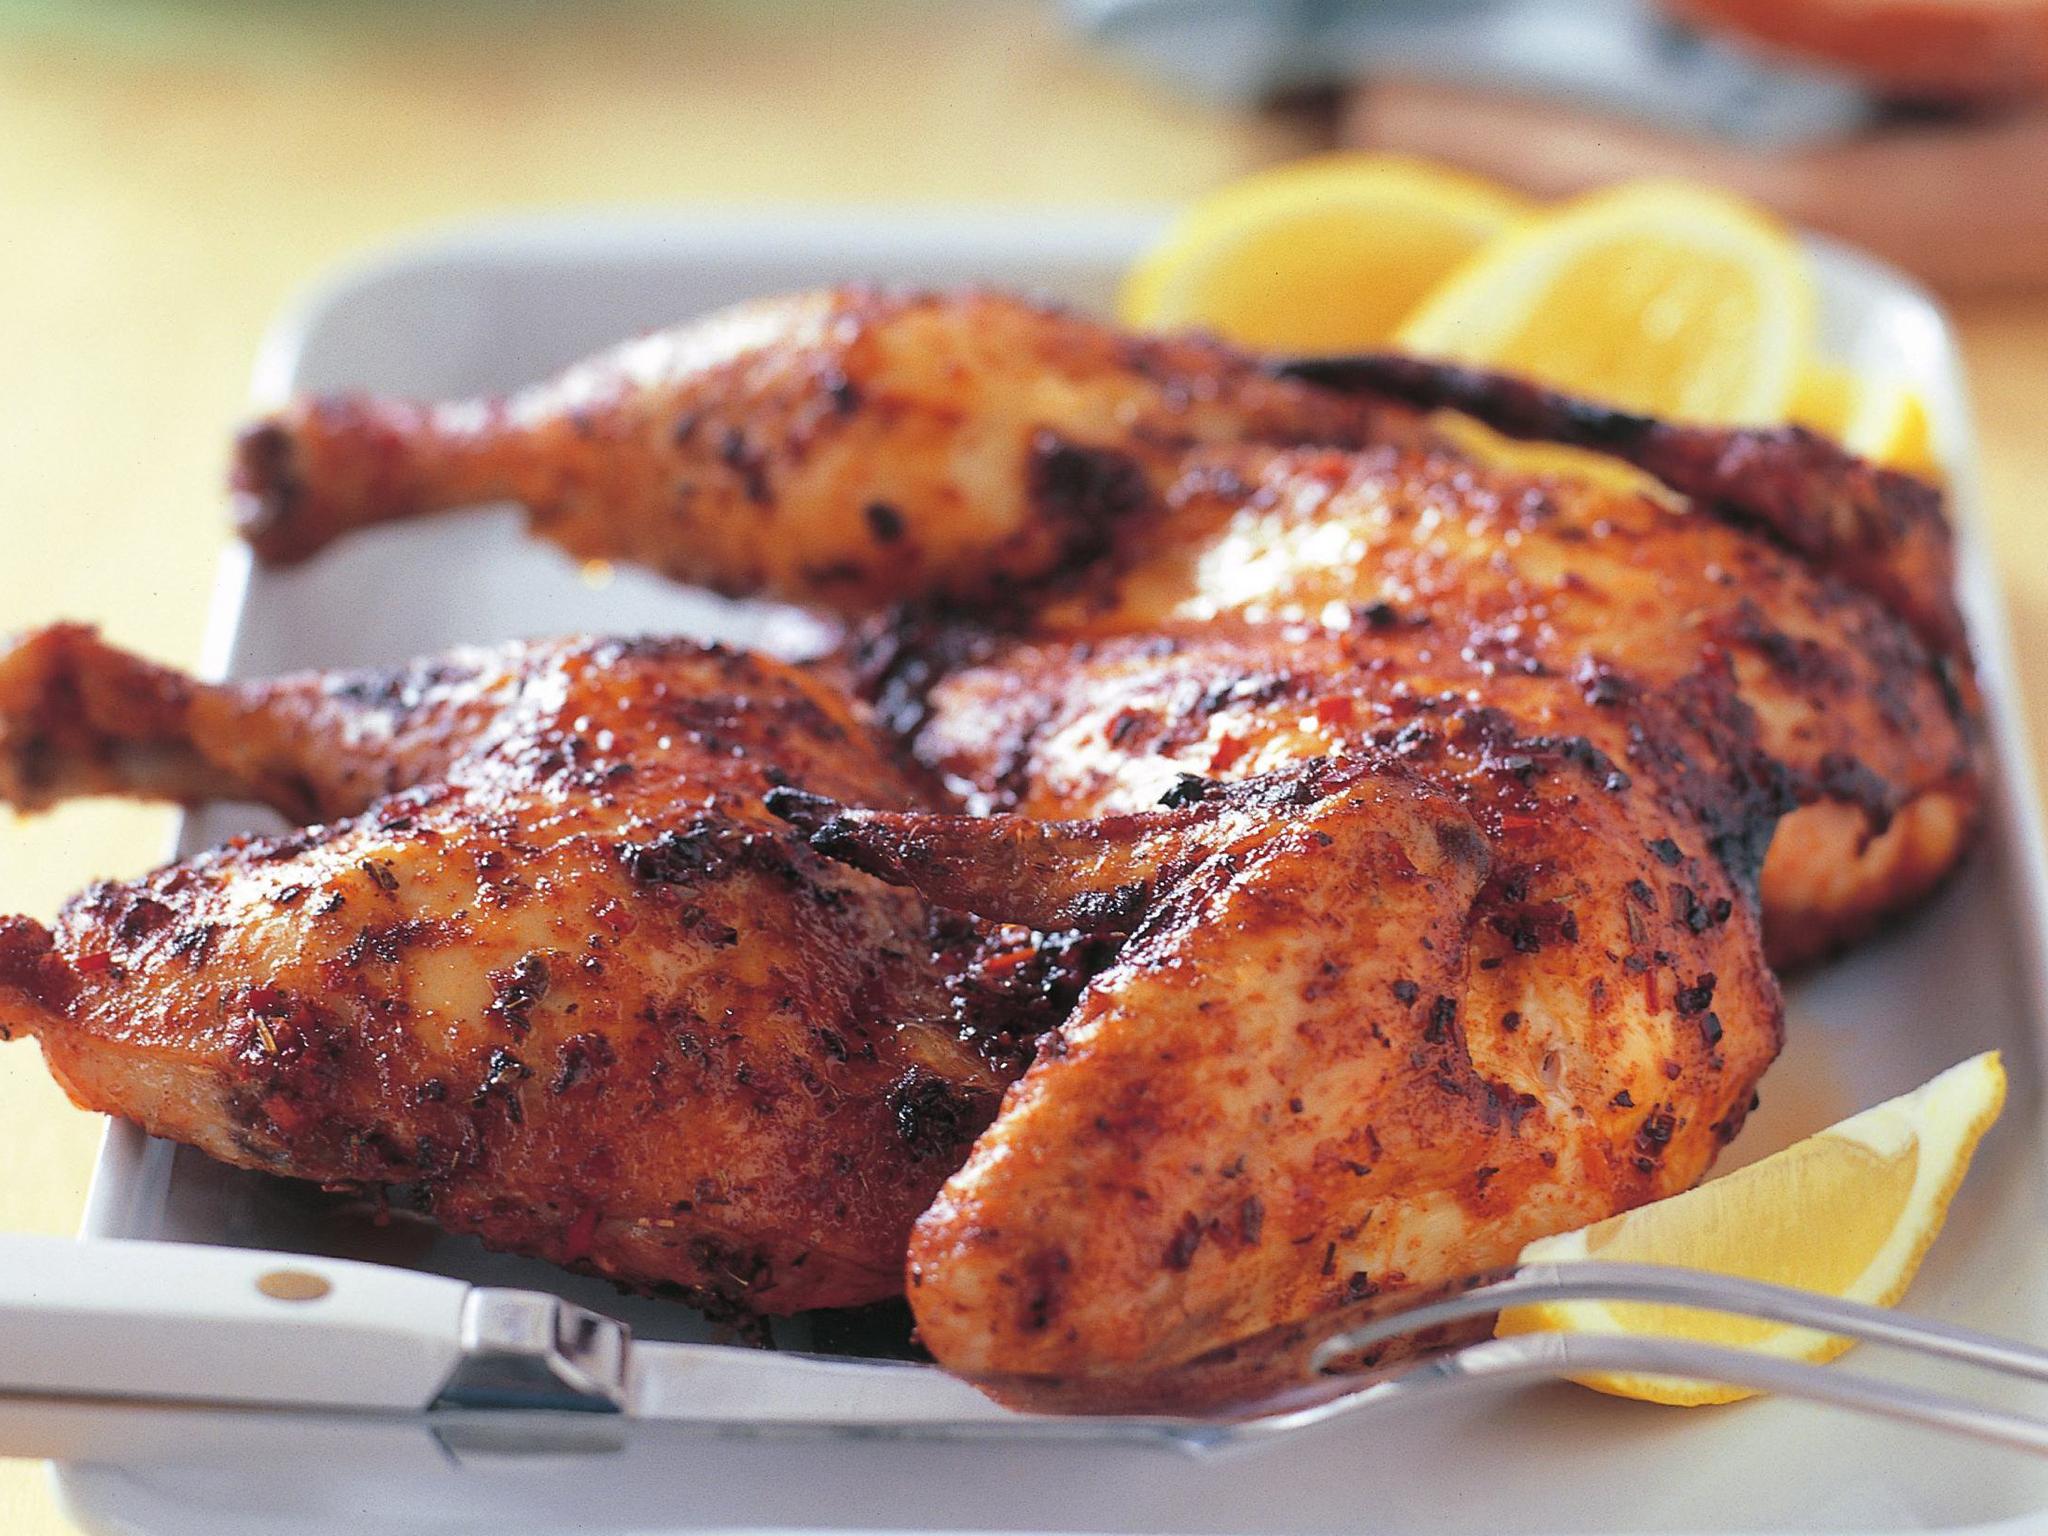 peri peri chicken - Recipe Fridays: Sadia Bhaabi's Peri Peri Chicken